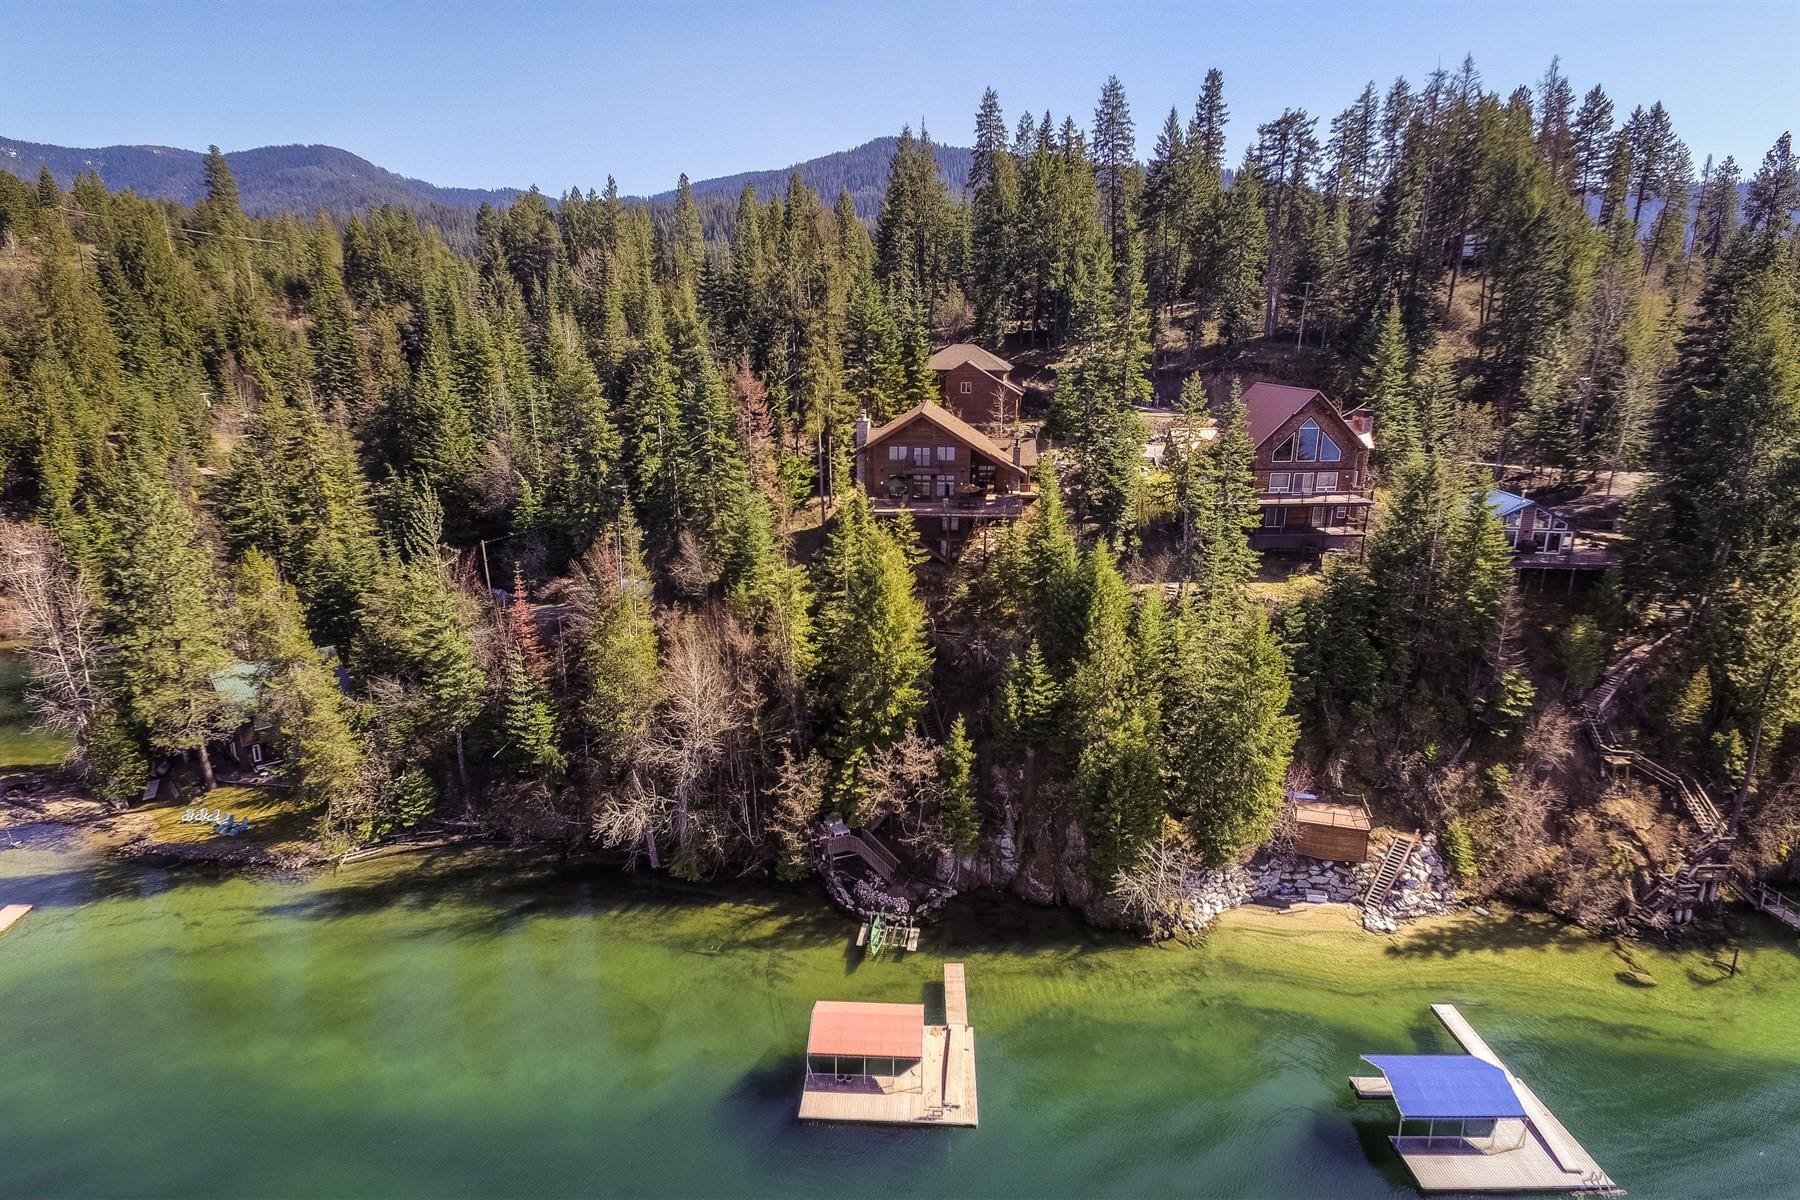 Moradia para Venda às Luxurious Hayden Lakefront Custom Home 8159 E Dal Dr, Hayden, Idaho, 83835 Estados Unidos